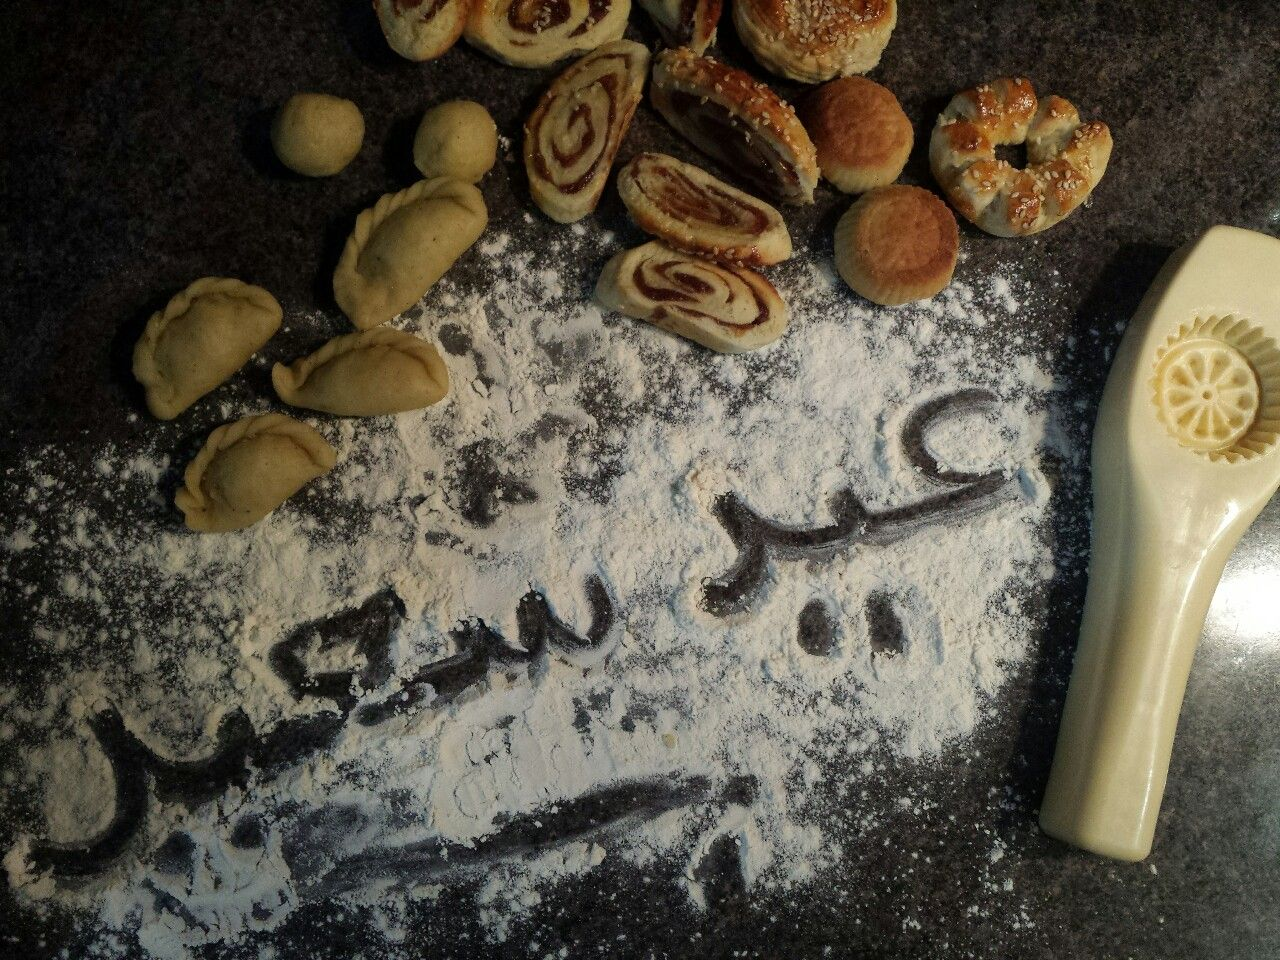 Iraq Shako Mako عيد سعيد وكل عام و انتم بالف خير Food Ramadan Cheese Board